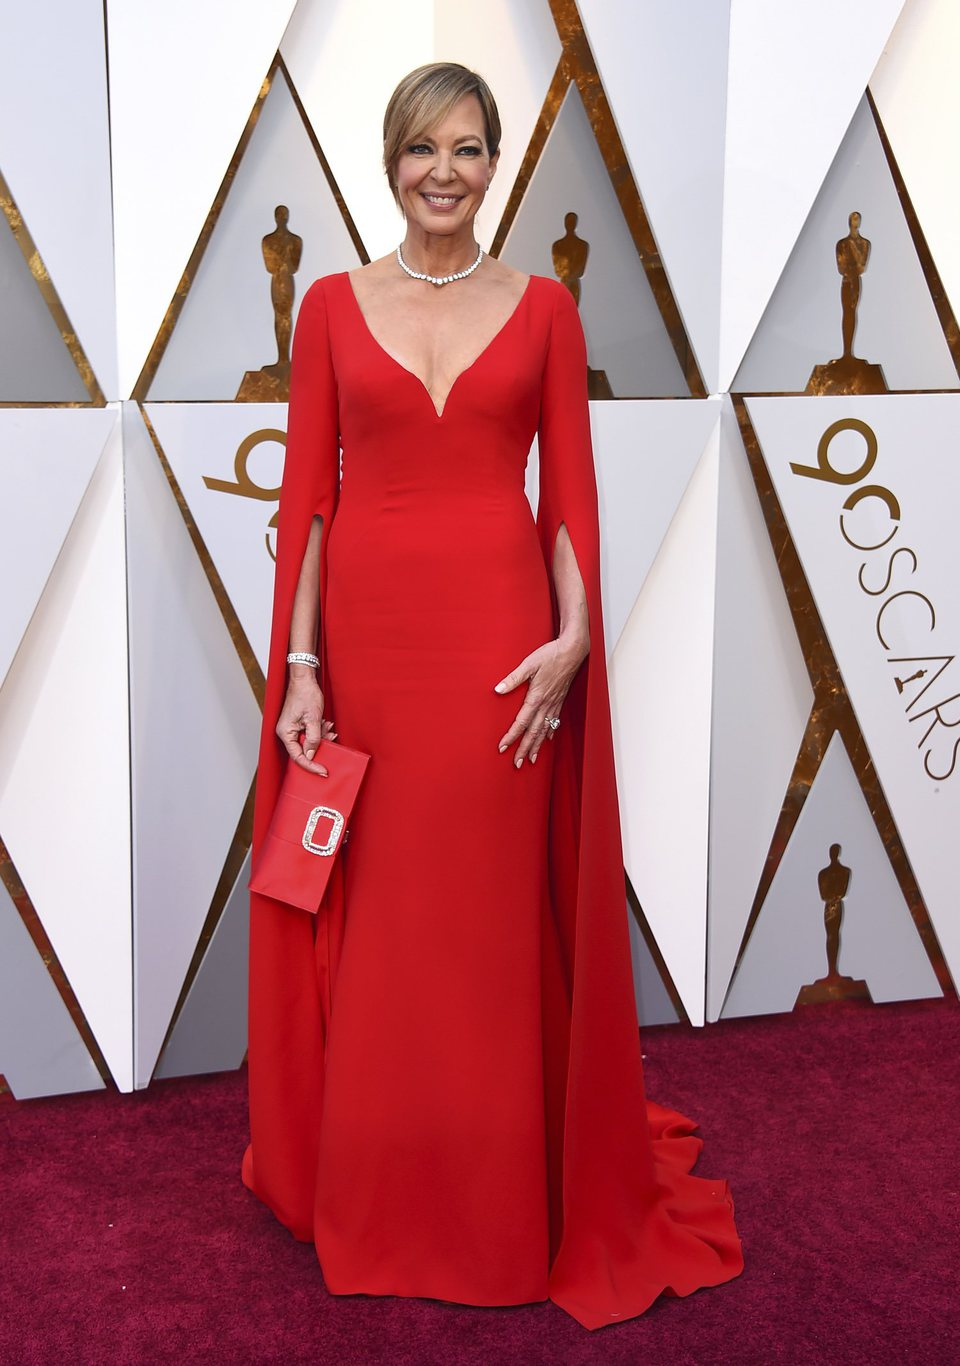 Allison Janney on the Oscar 2018 red carpet